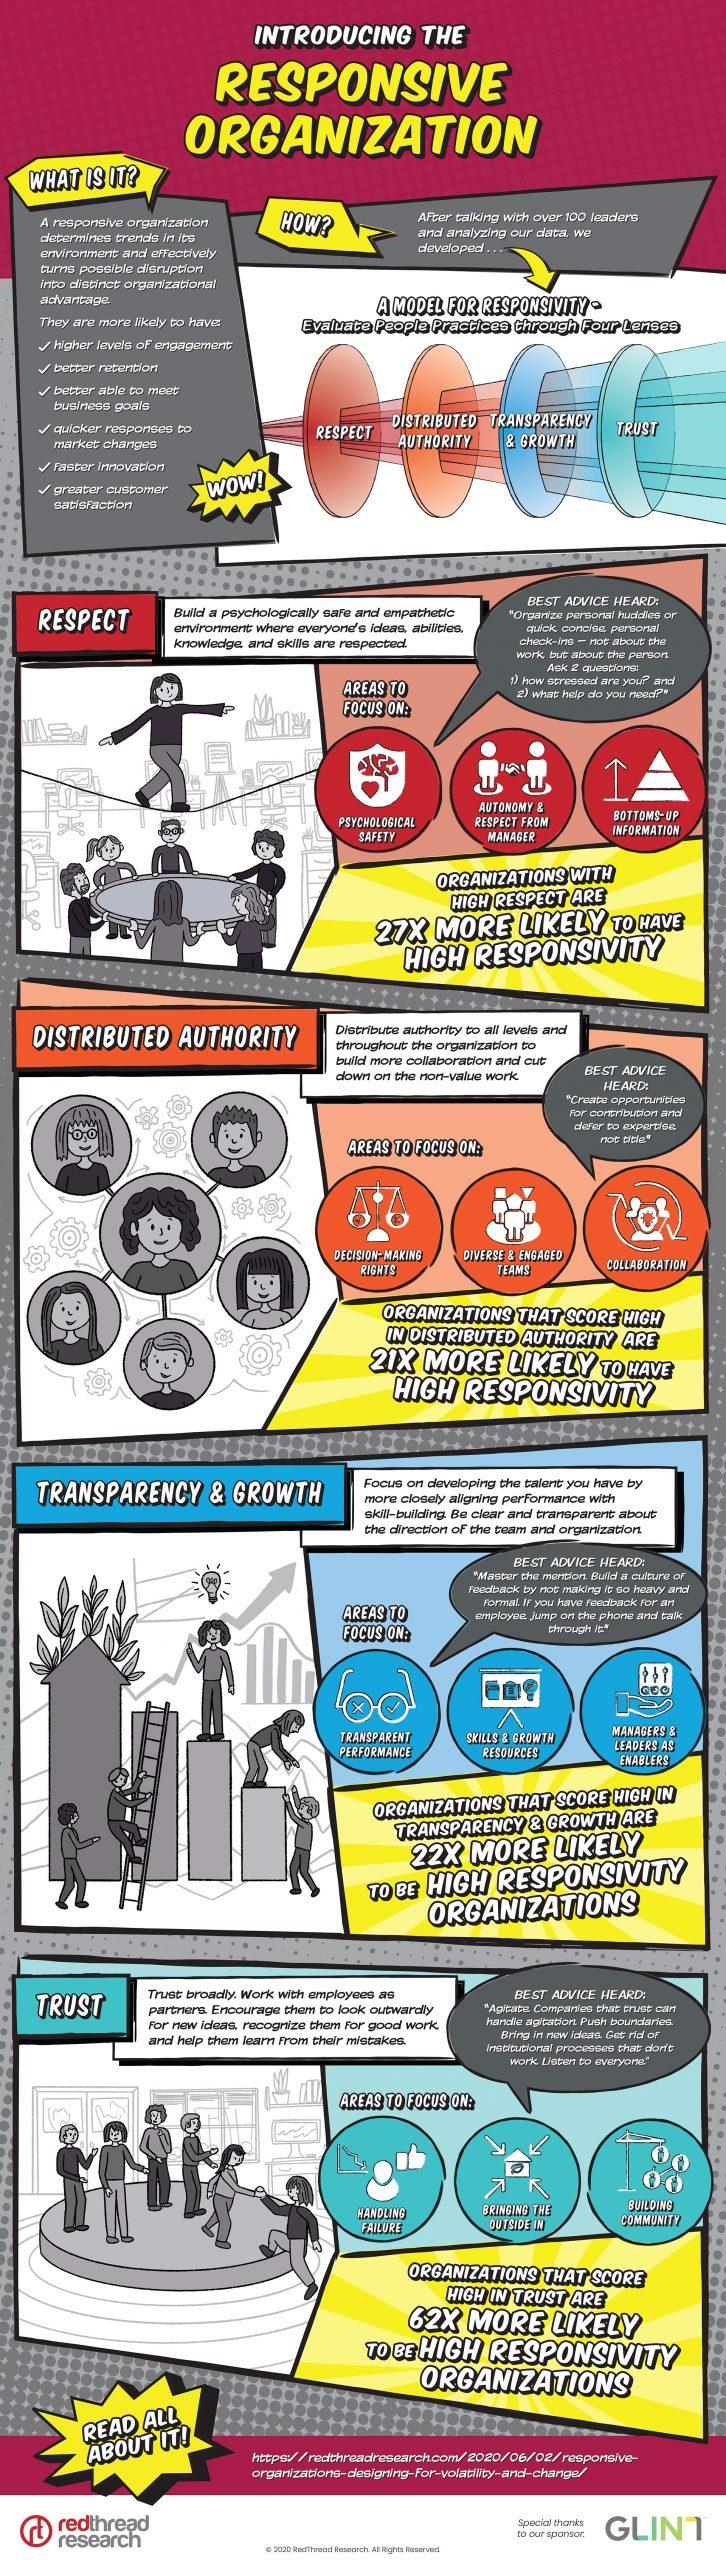 The Responsive Organization: Infographic